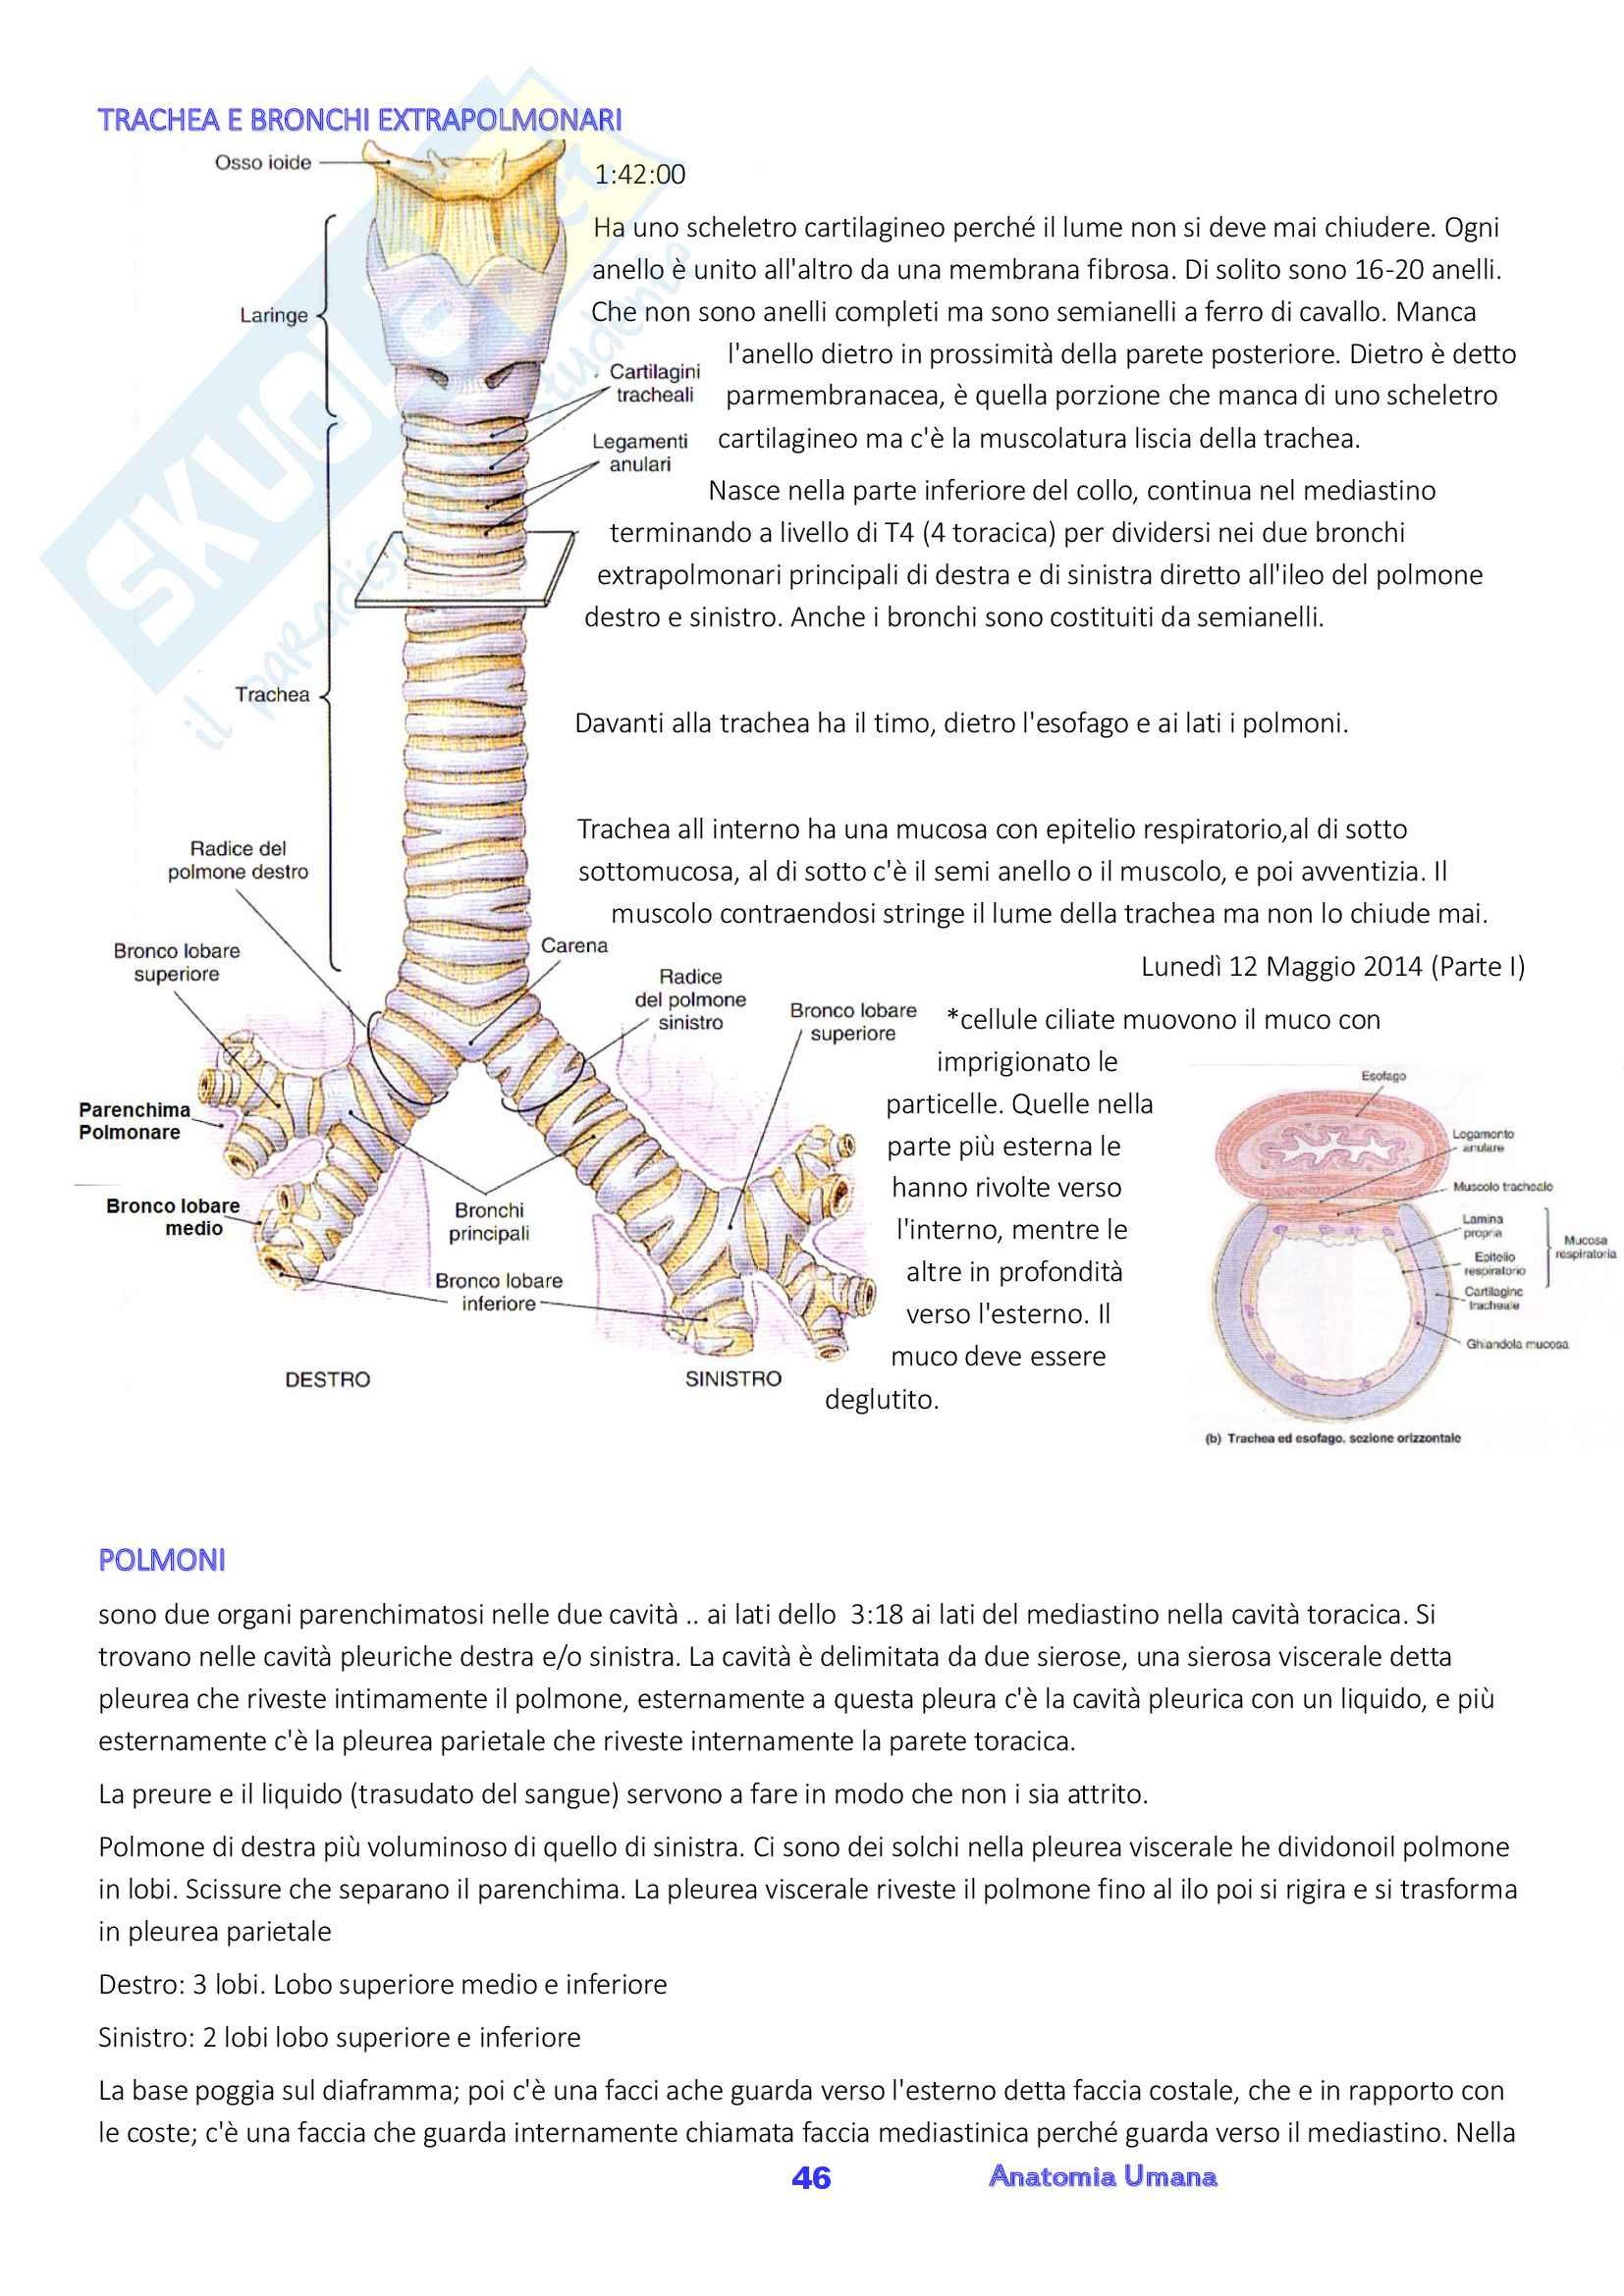 Anatomia umana, Appunti, Prof.ssa Ferretti Pag. 46